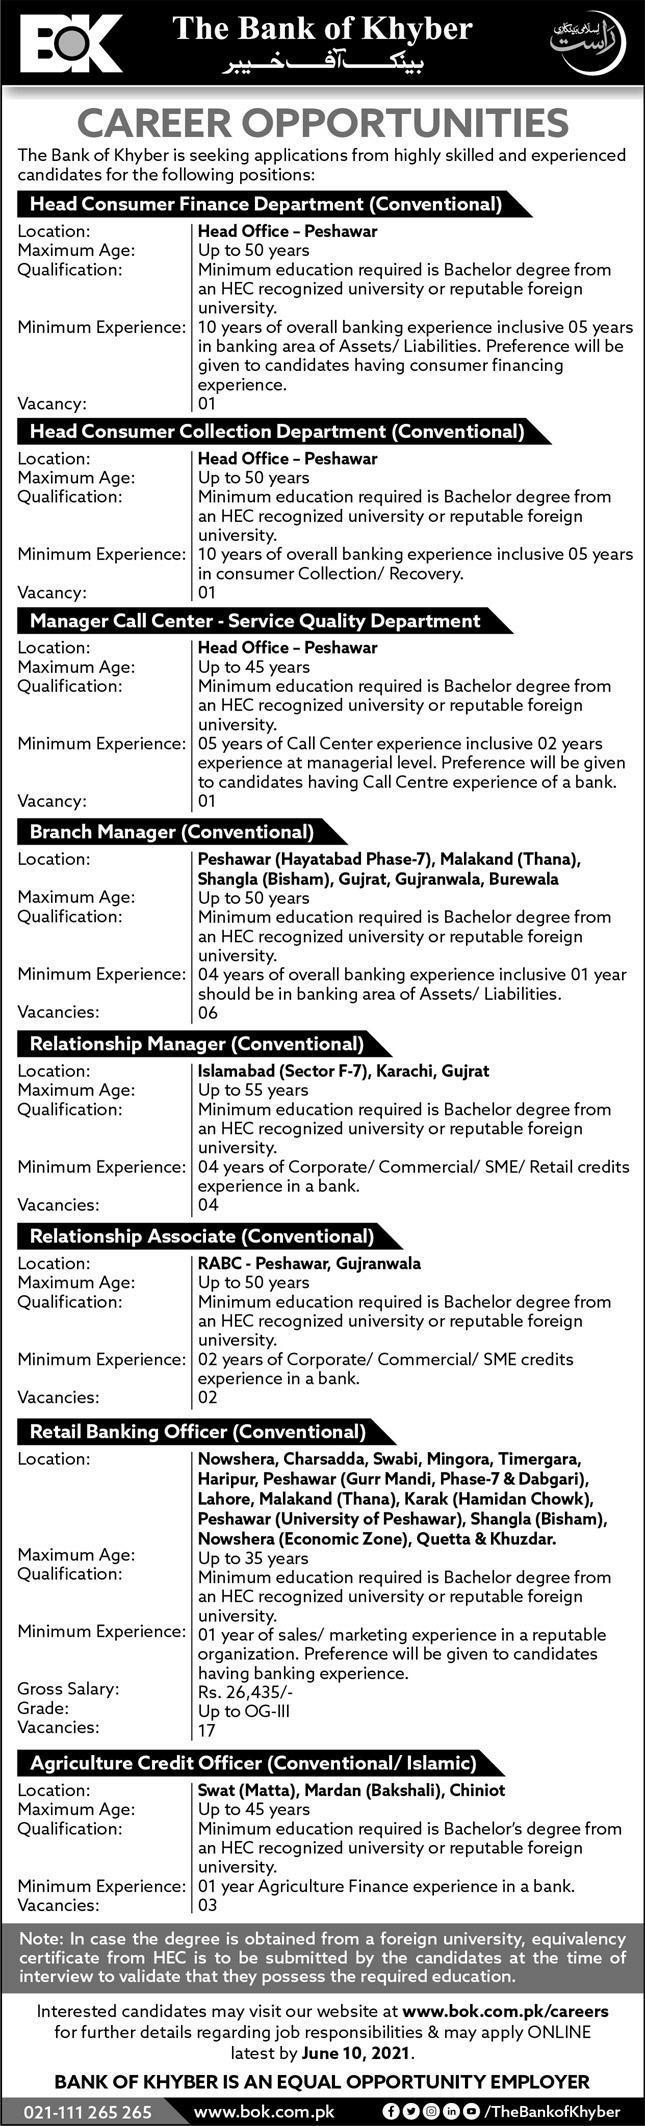 Bank of Khyber (BOK) Jobs May 2021